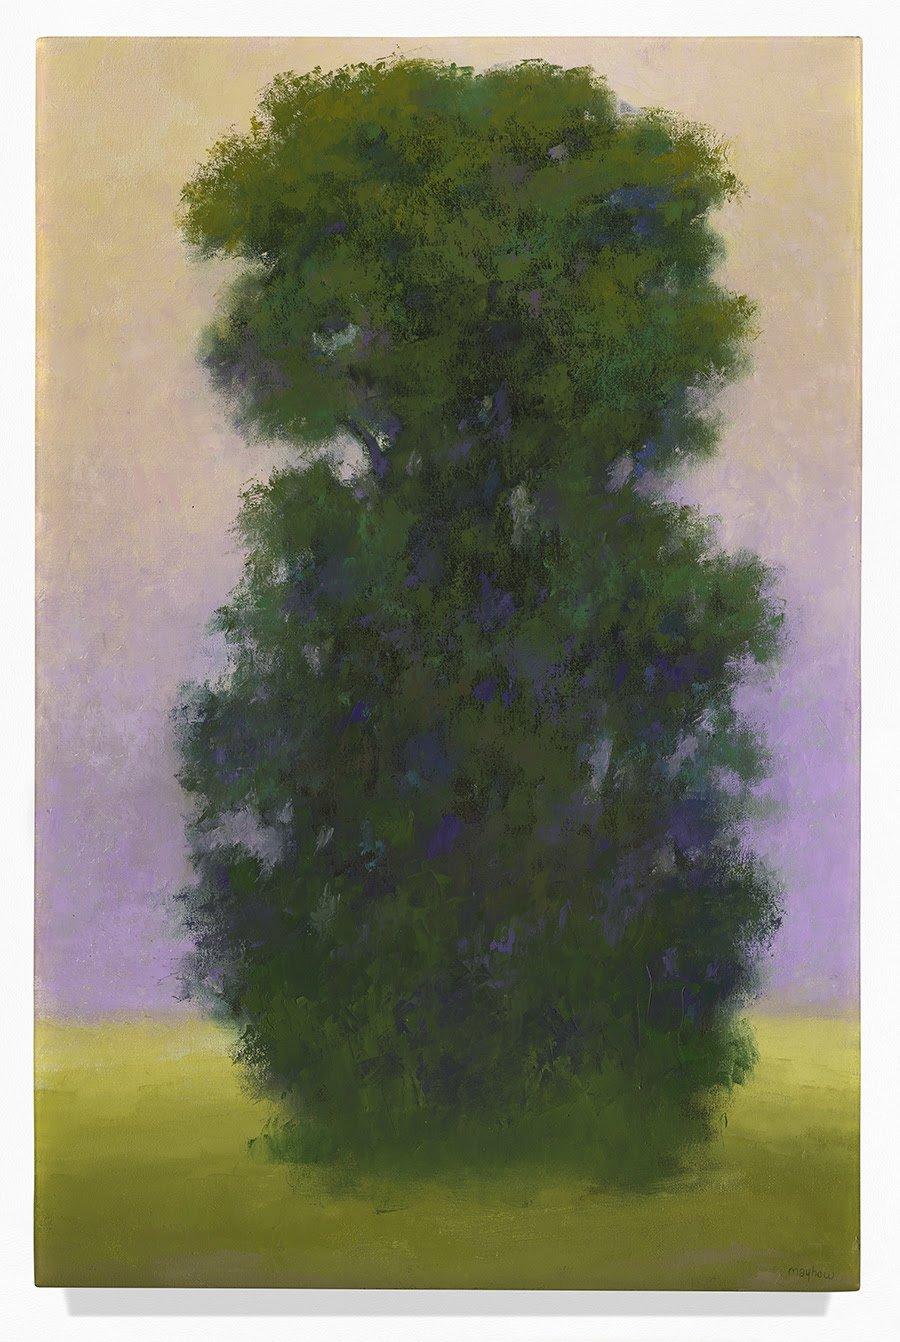 Richard Mayhew, Perennial Sentinel, 2000; San Francisco Museum of Modern Art, gift of the Joyner/Giuffrida Collection; © Richard Mayhew